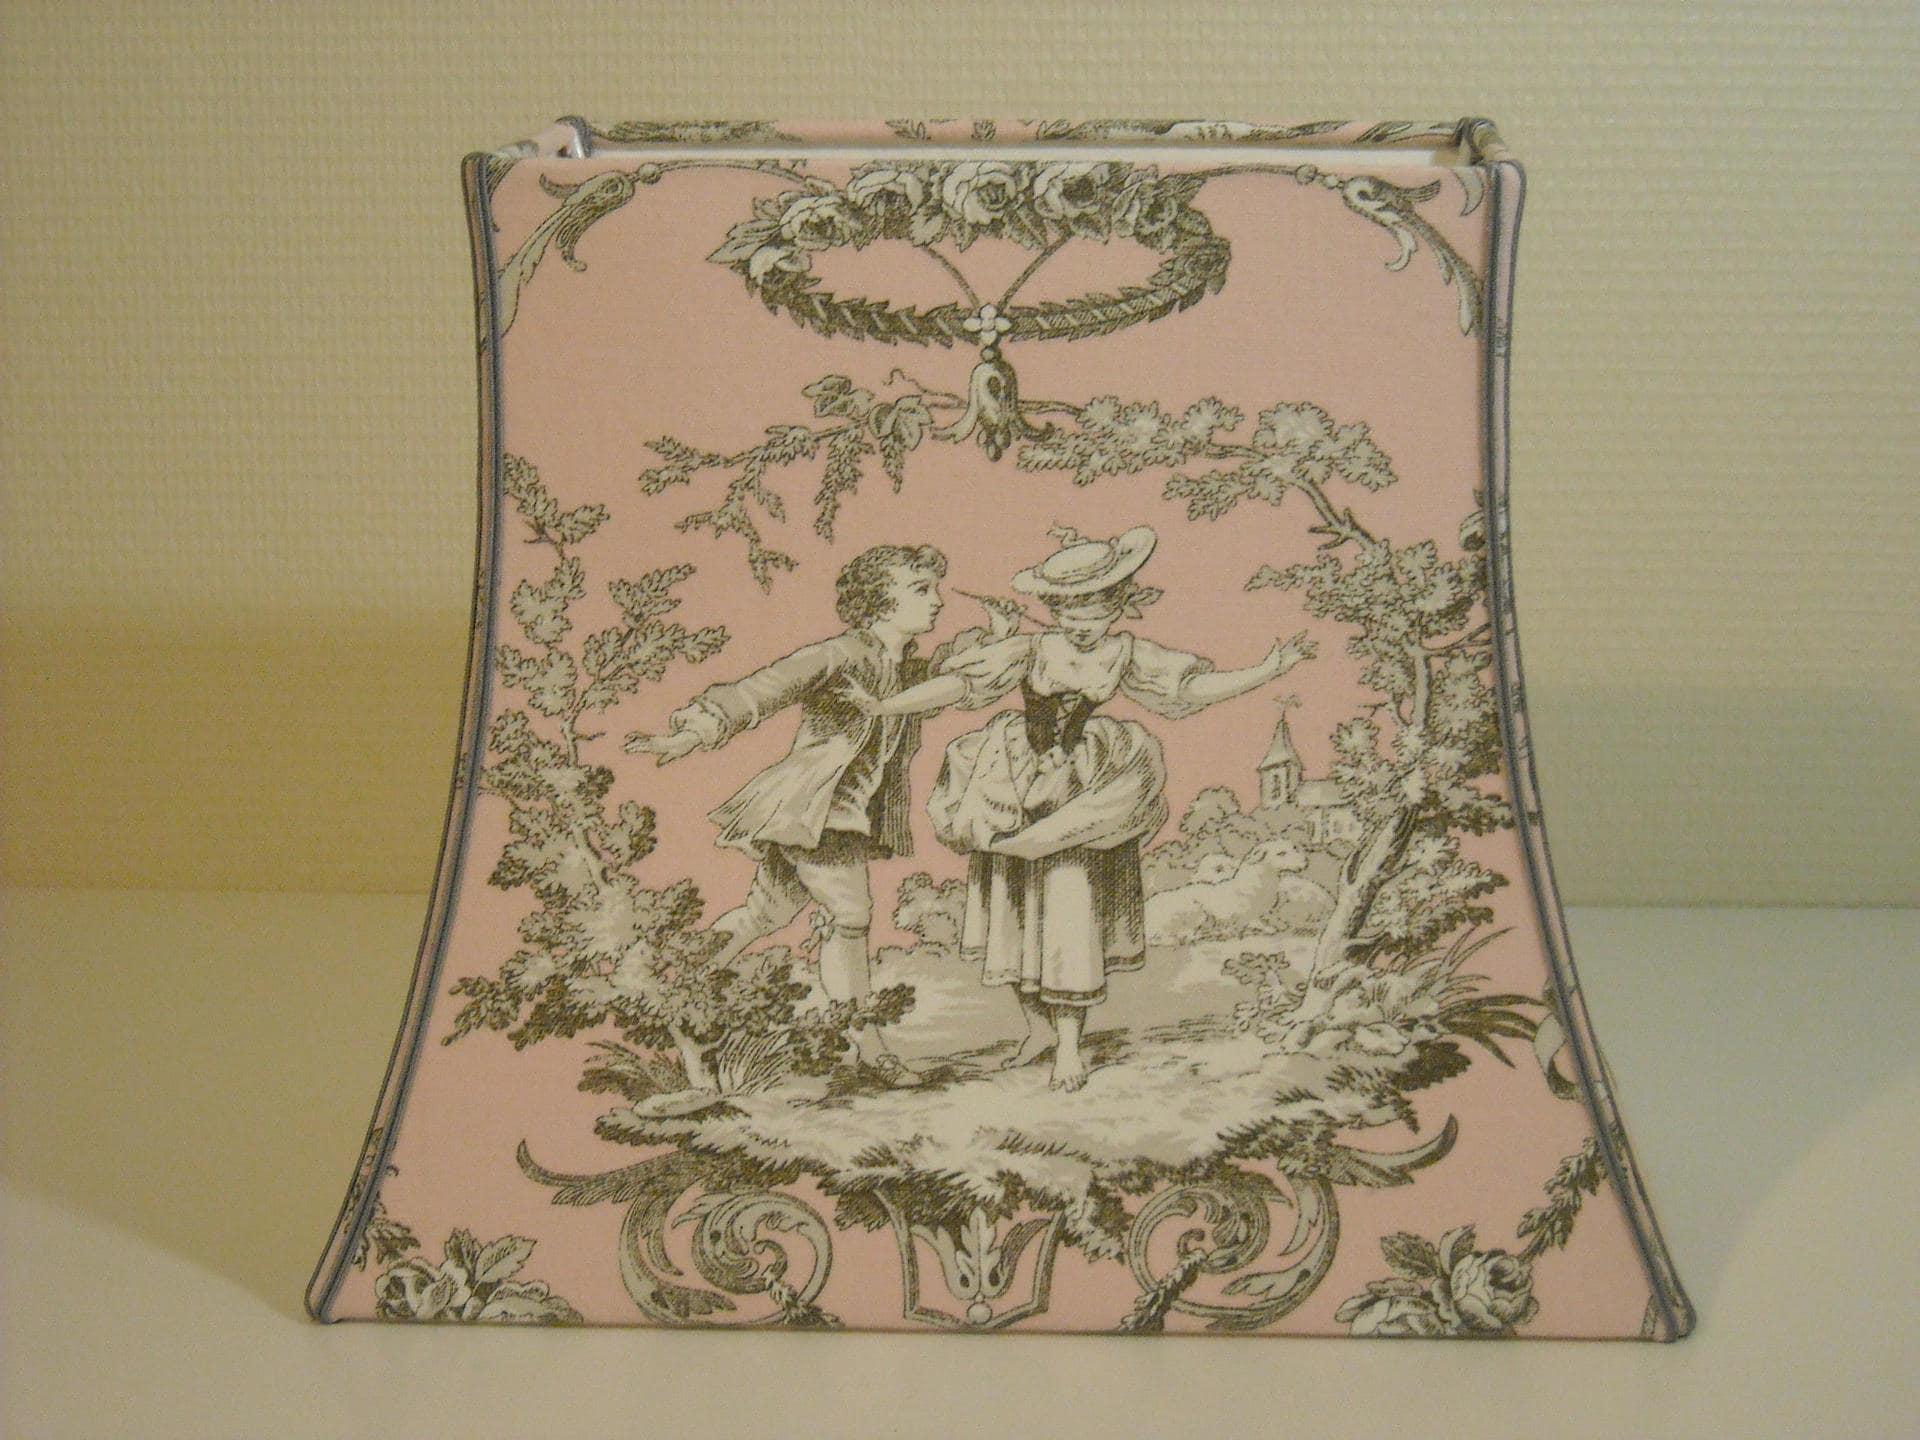 abat jour forme pagode rectangle en toile de jouy rose et gris. Black Bedroom Furniture Sets. Home Design Ideas